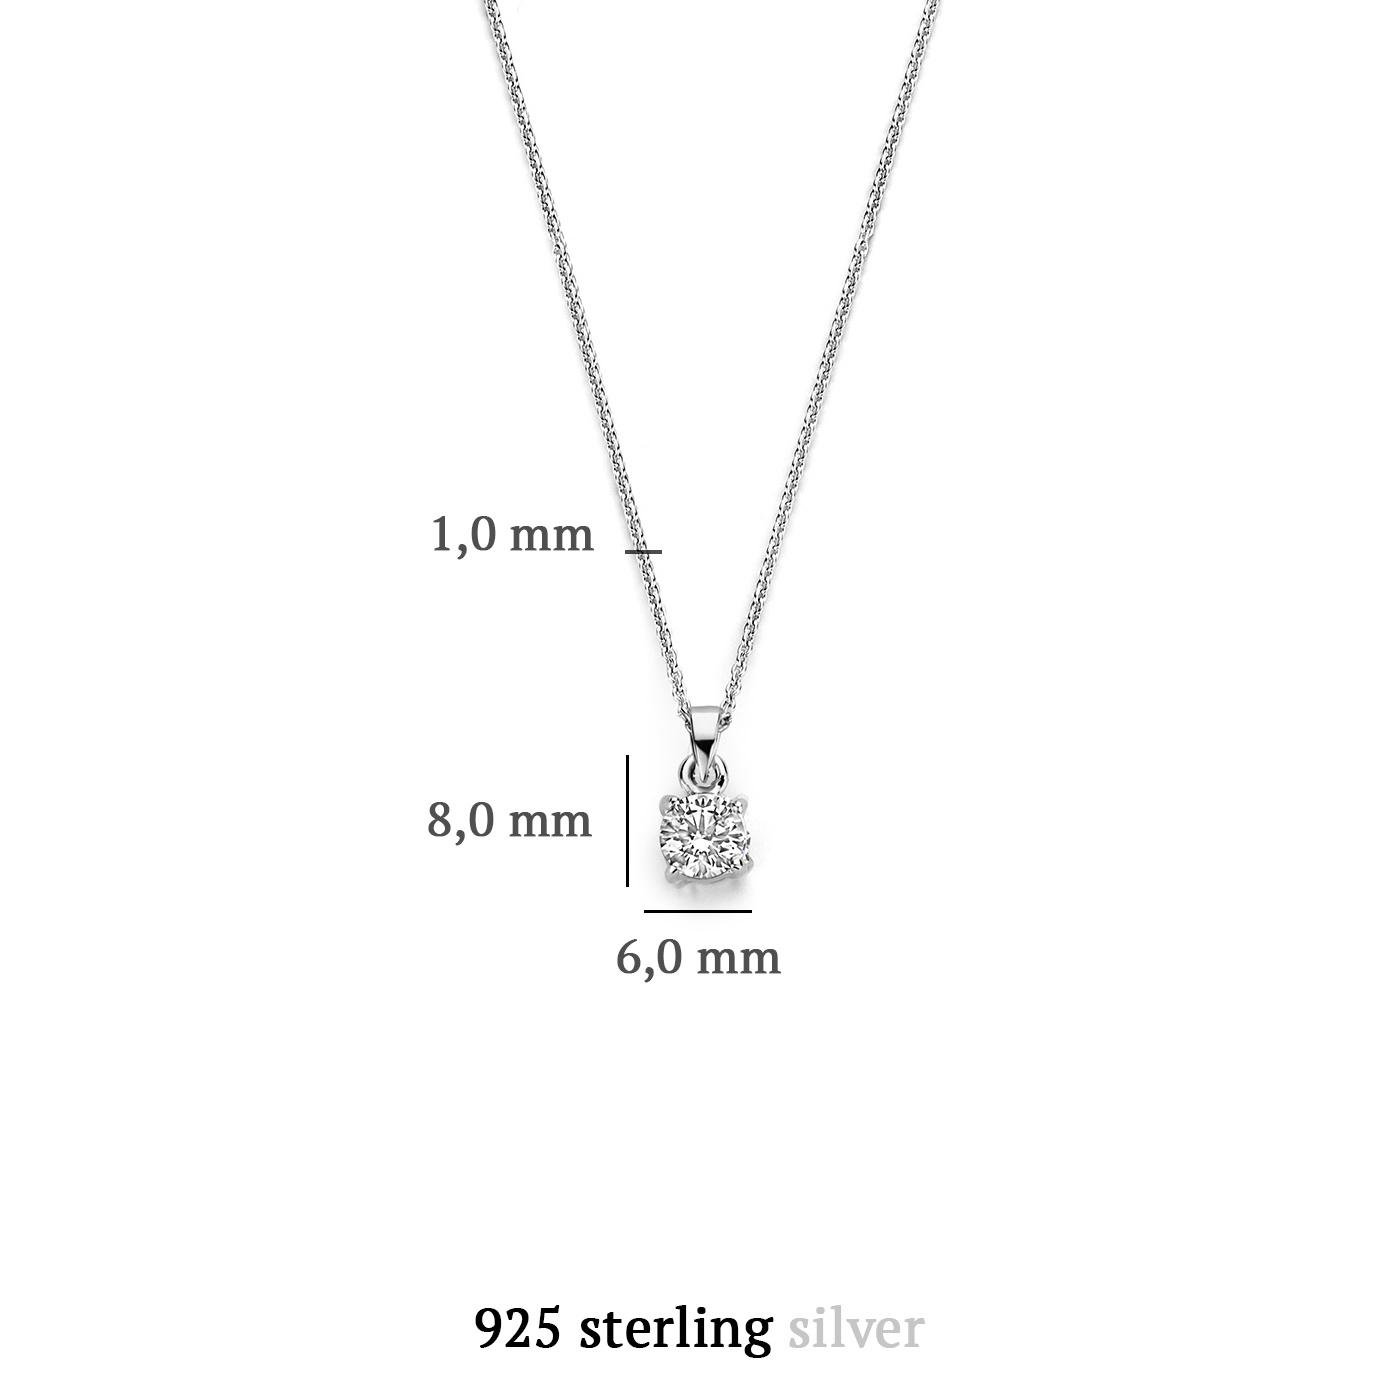 Parte di Me Bella Vita Sienna collier en argent sterling 925